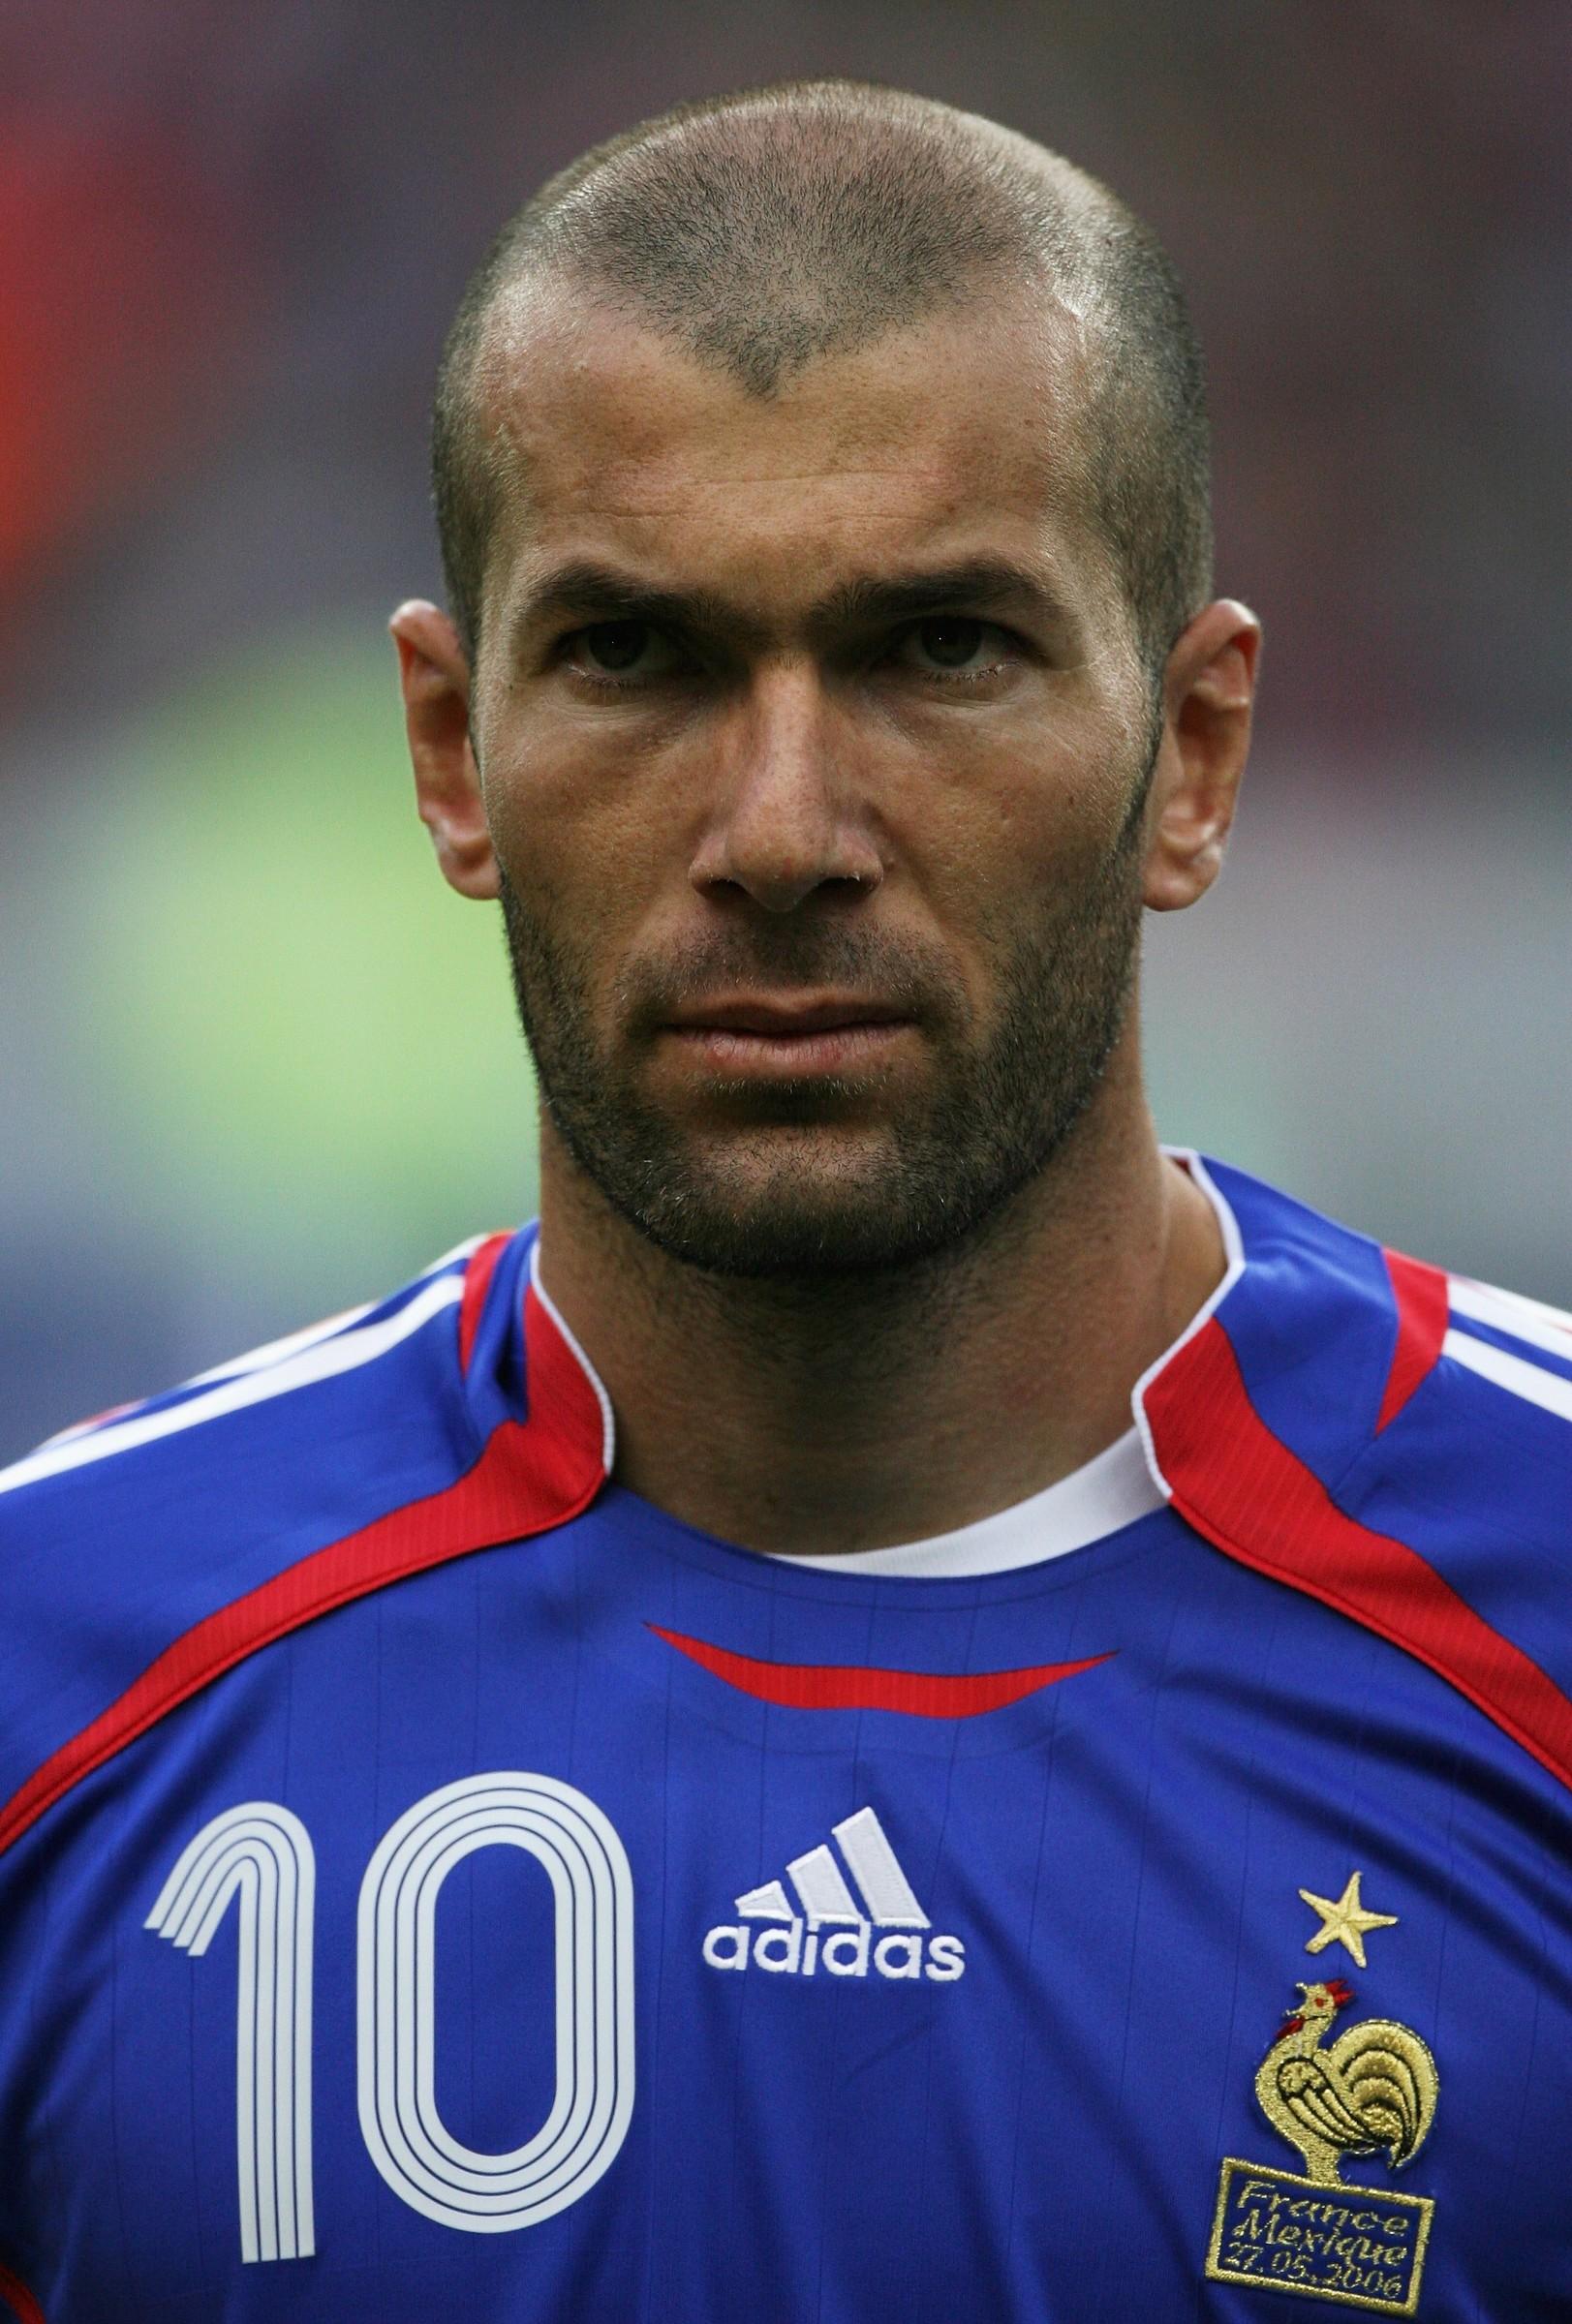 Zinedine Zidane photo 54 of 63 pics wallpaper photo